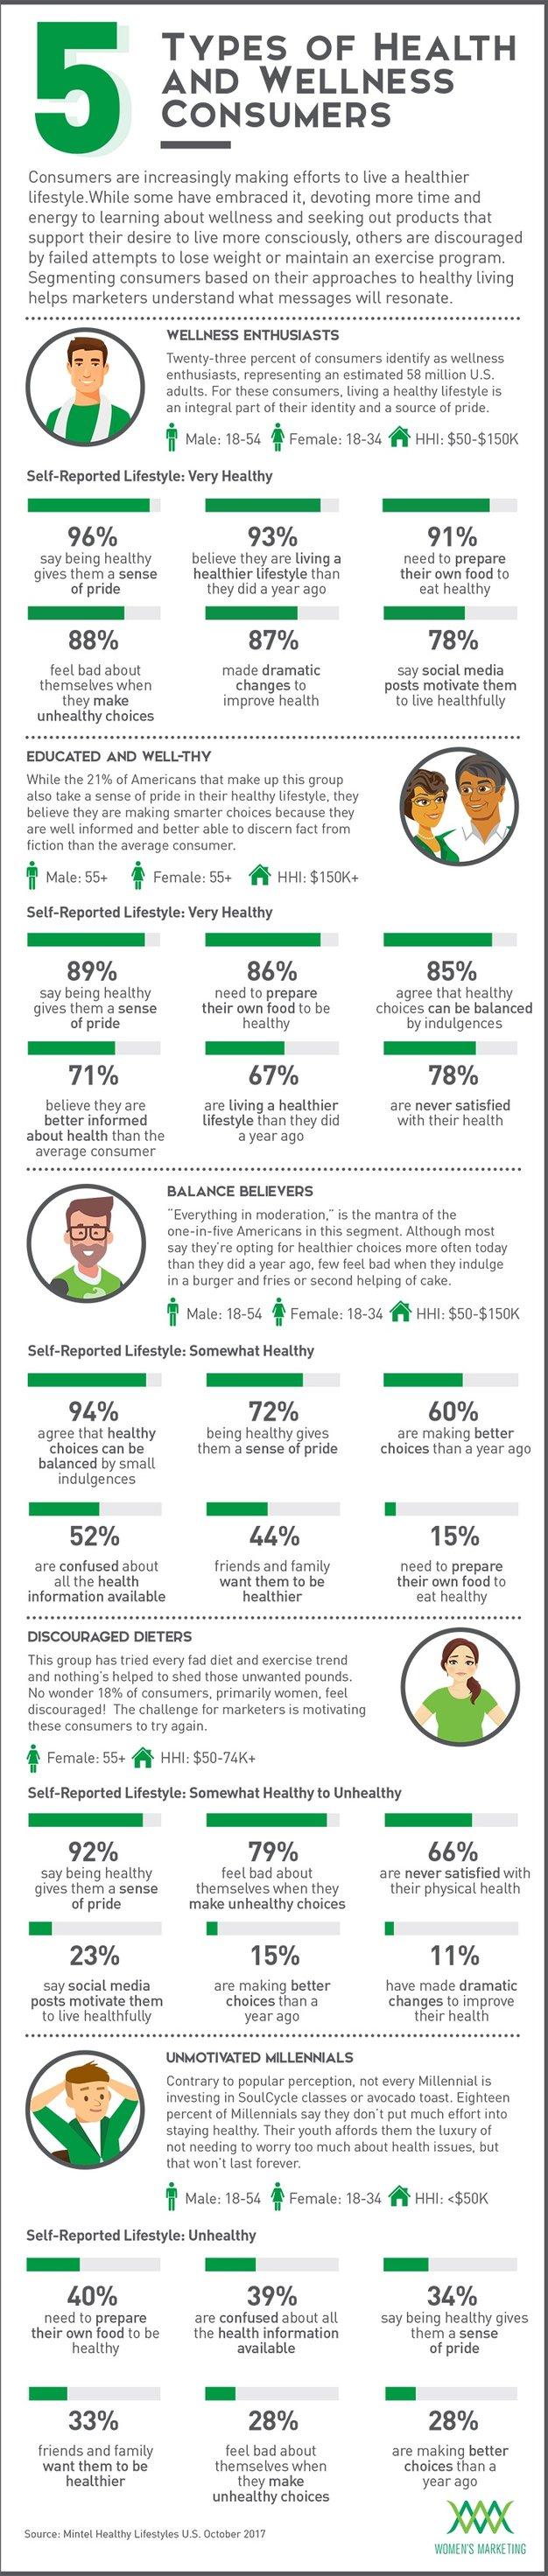 TypesofHealth&Wellness_Infographic.jpg